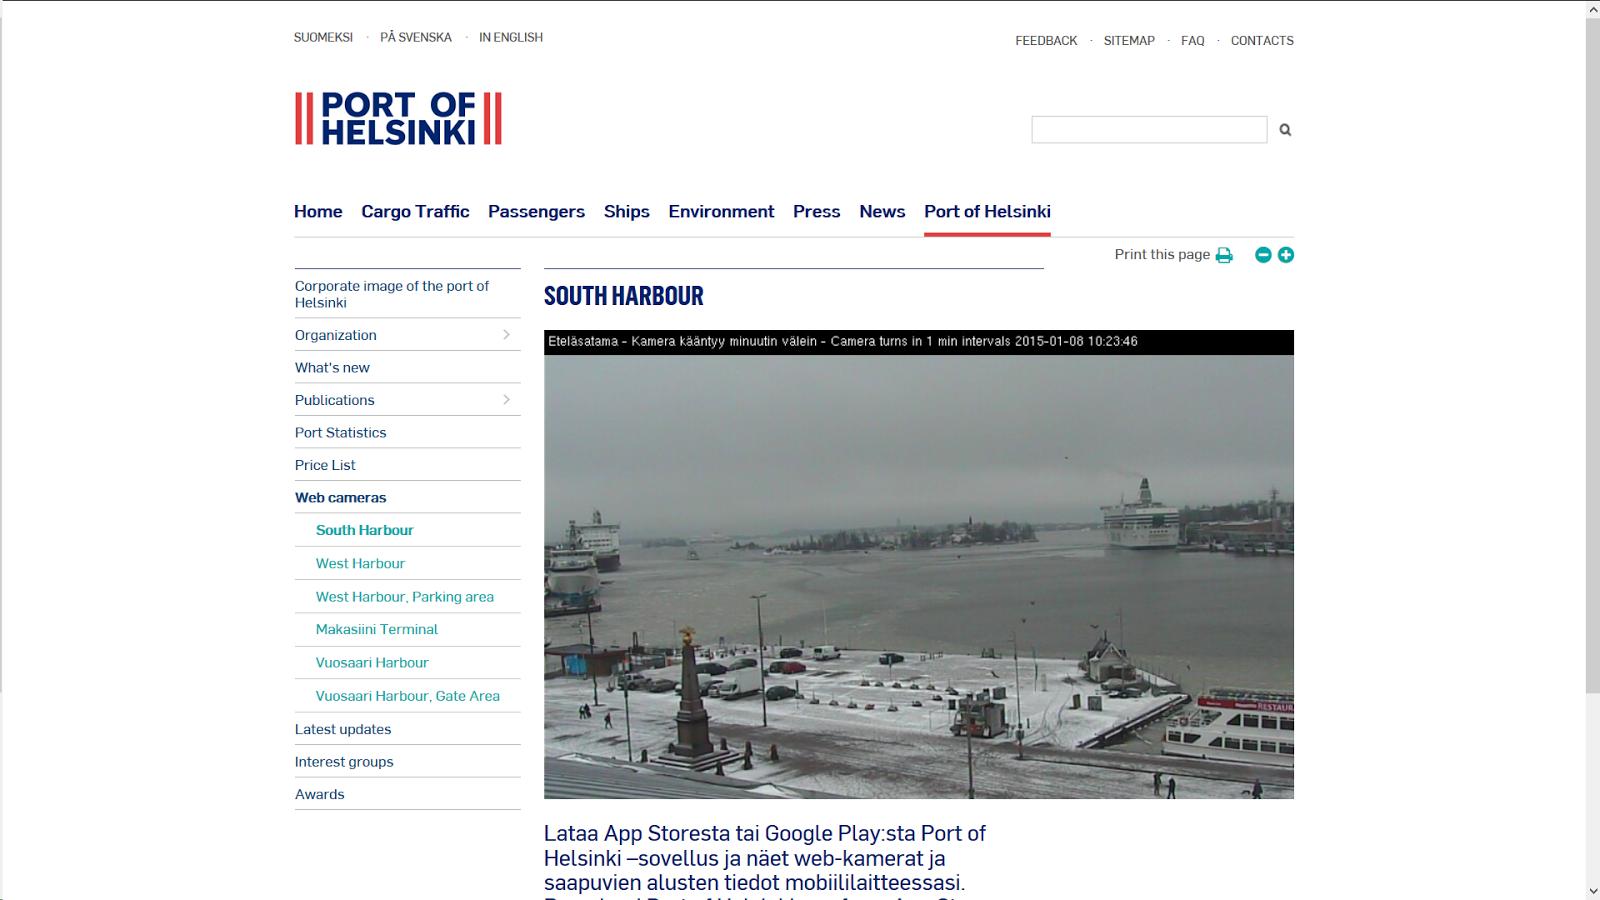 http://www.portofhelsinki.fi/port_of_helsinki/web_cameras/south_harbour